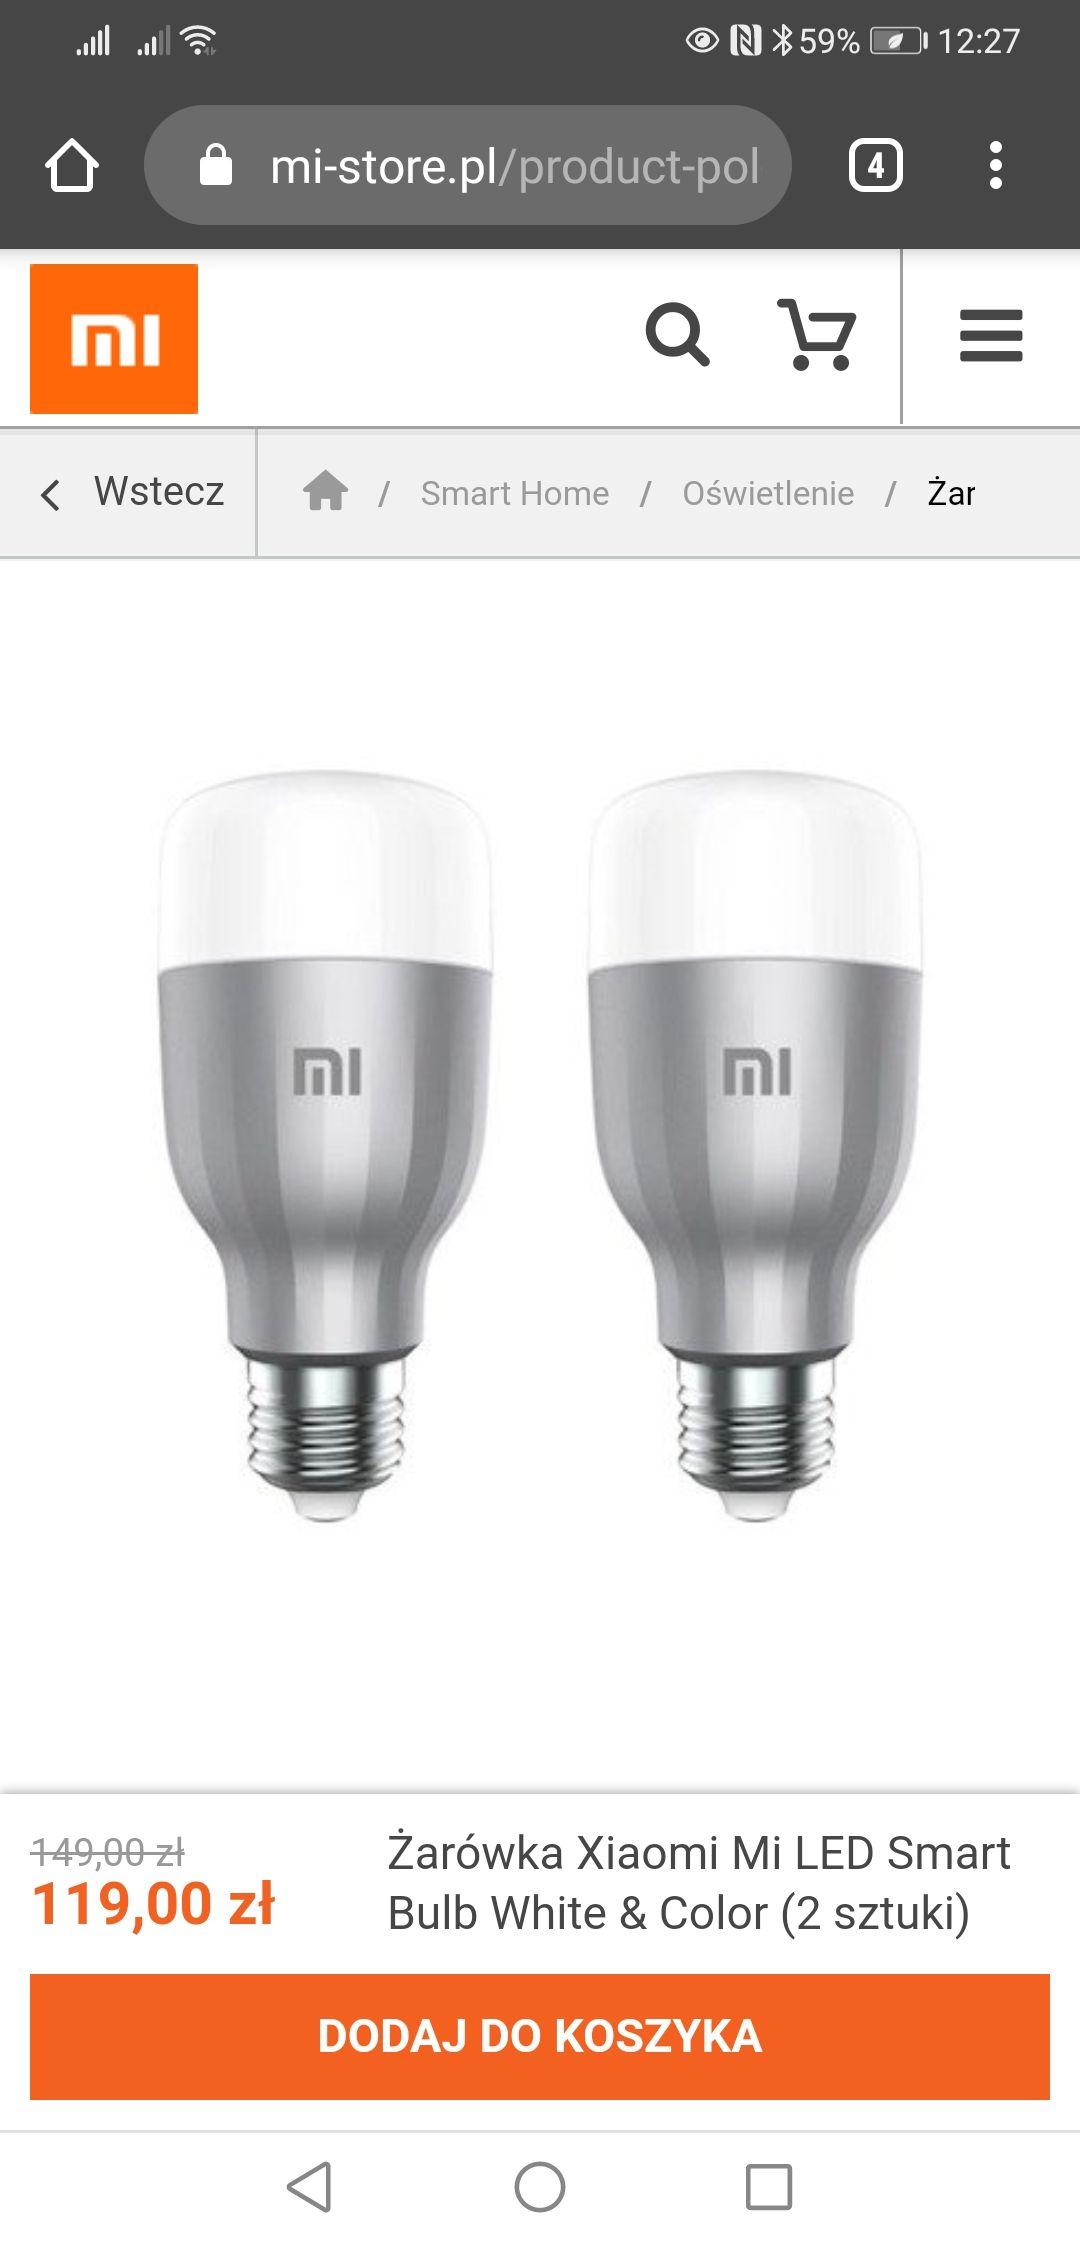 Żarówka Xiaomi Mi LED Smart Bulb White & Color (2 sztuki)